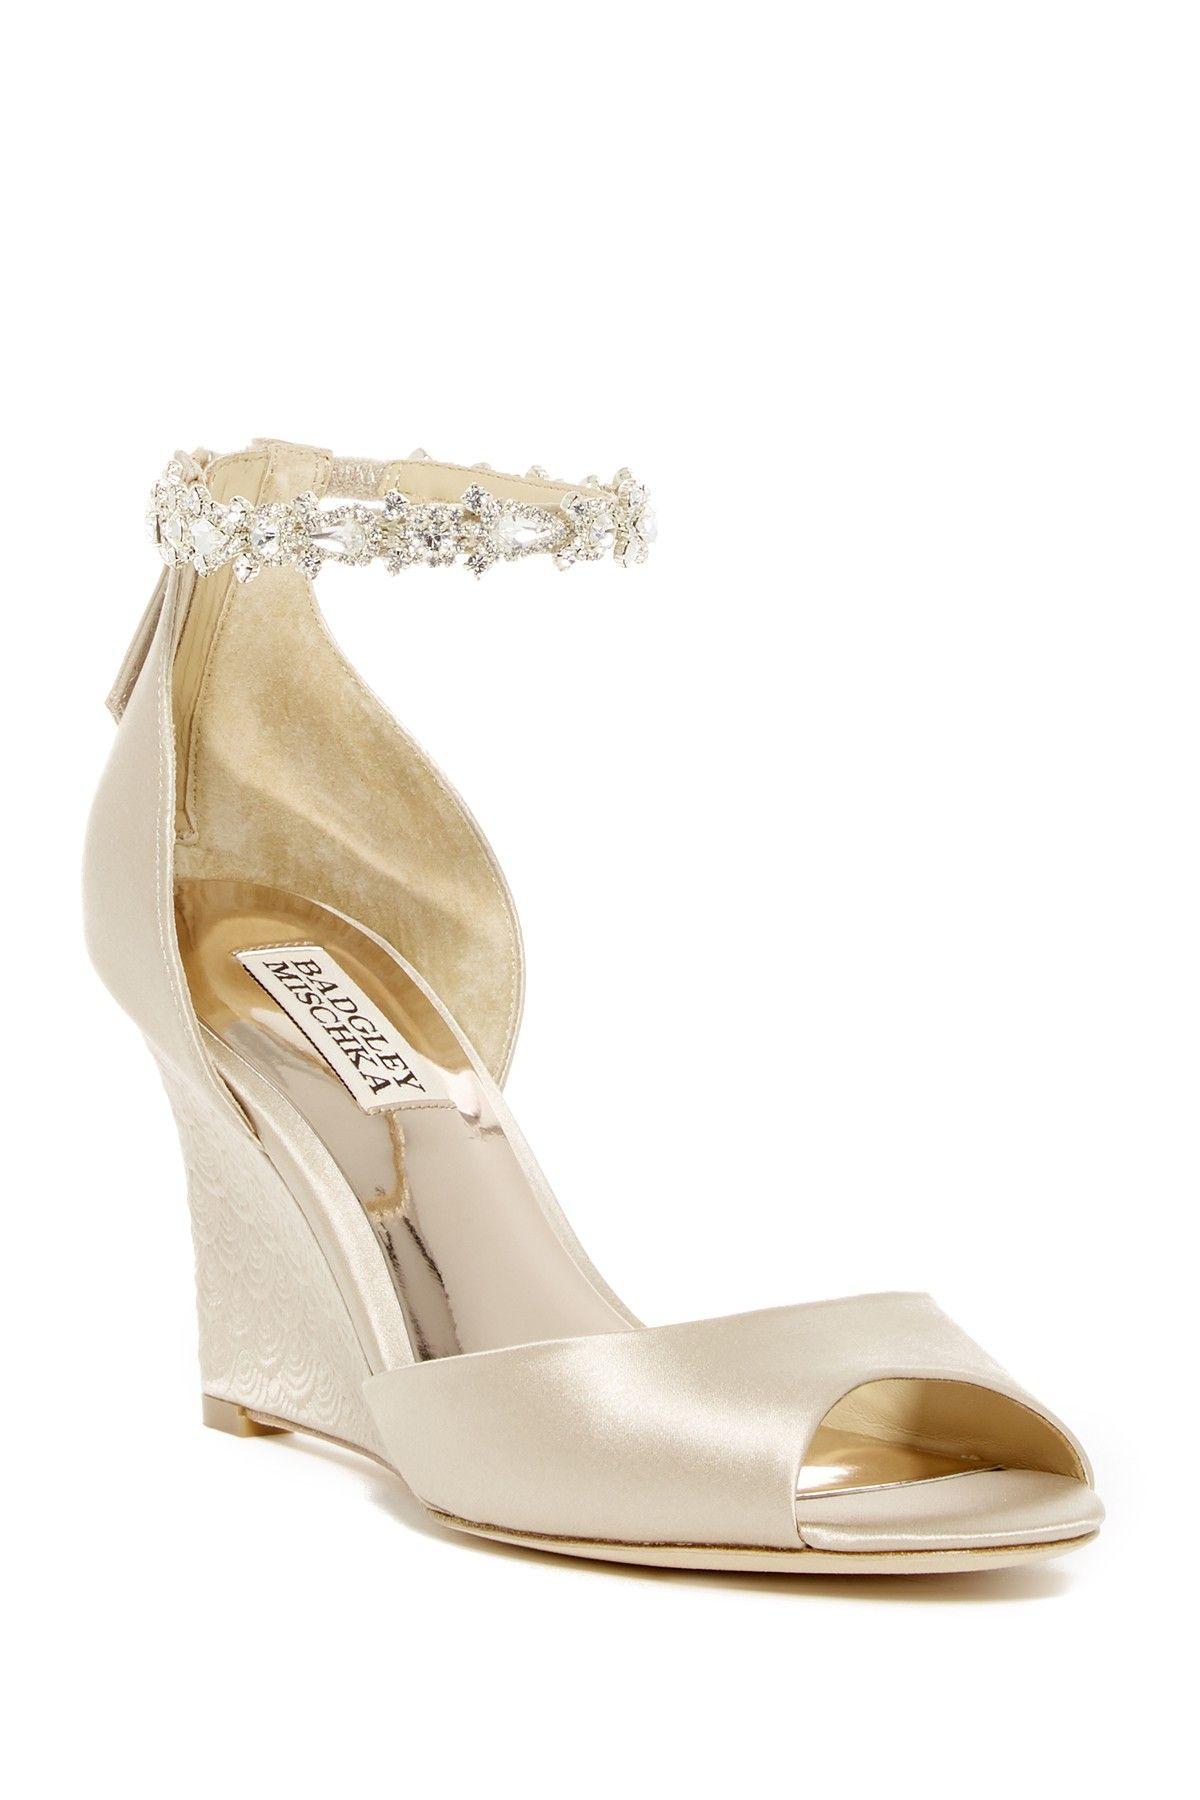 3925b8cb53e6 Badgley Mischka Tahlia Crystal Ankle Strap Sandal (Women)